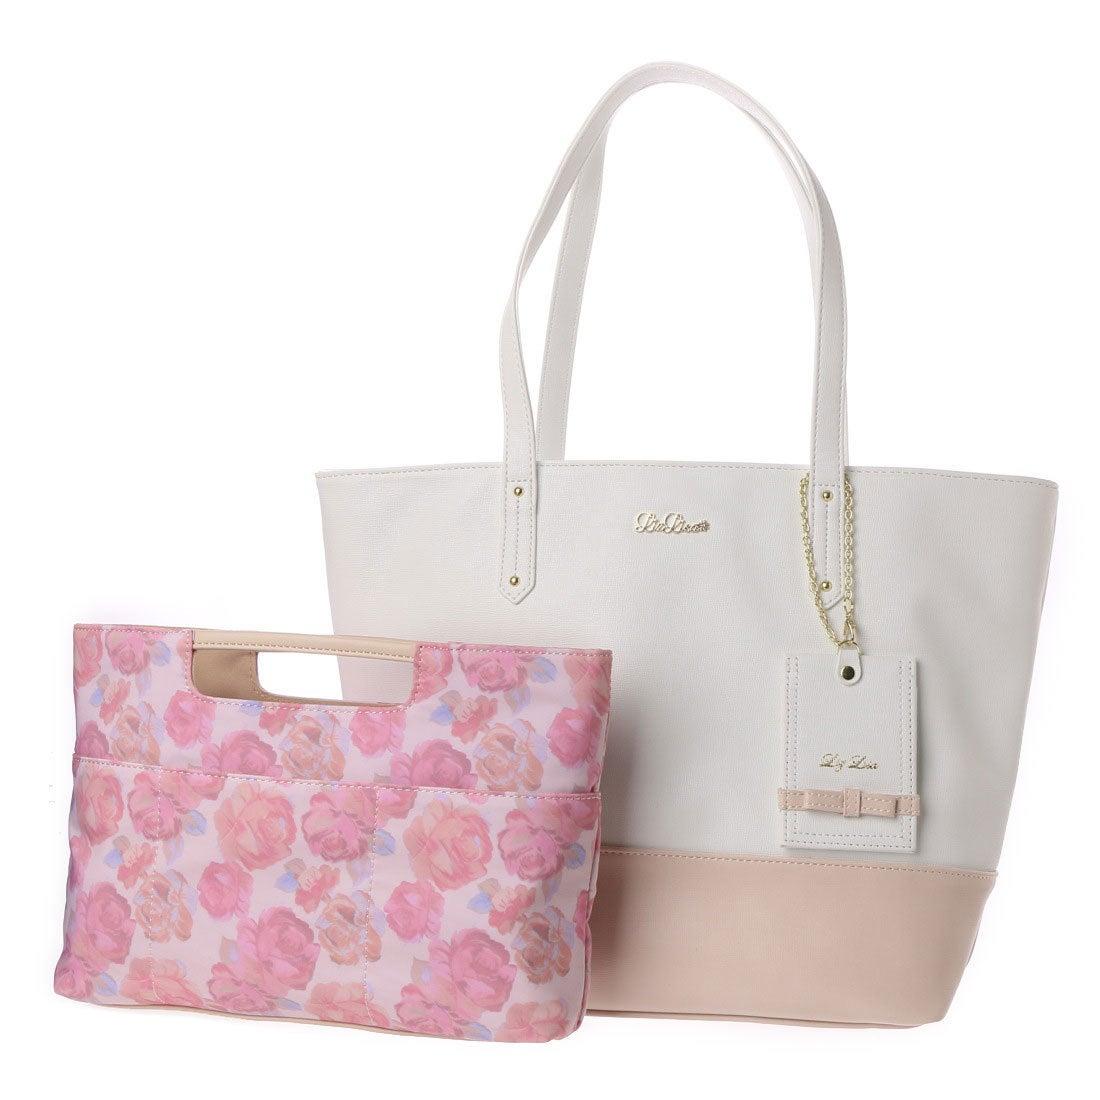 【SALE 50%OFF】リズリサ LIZ LISA ロペラ バッグインバッグ付トートバッグ(大) (ホワイト) レディース